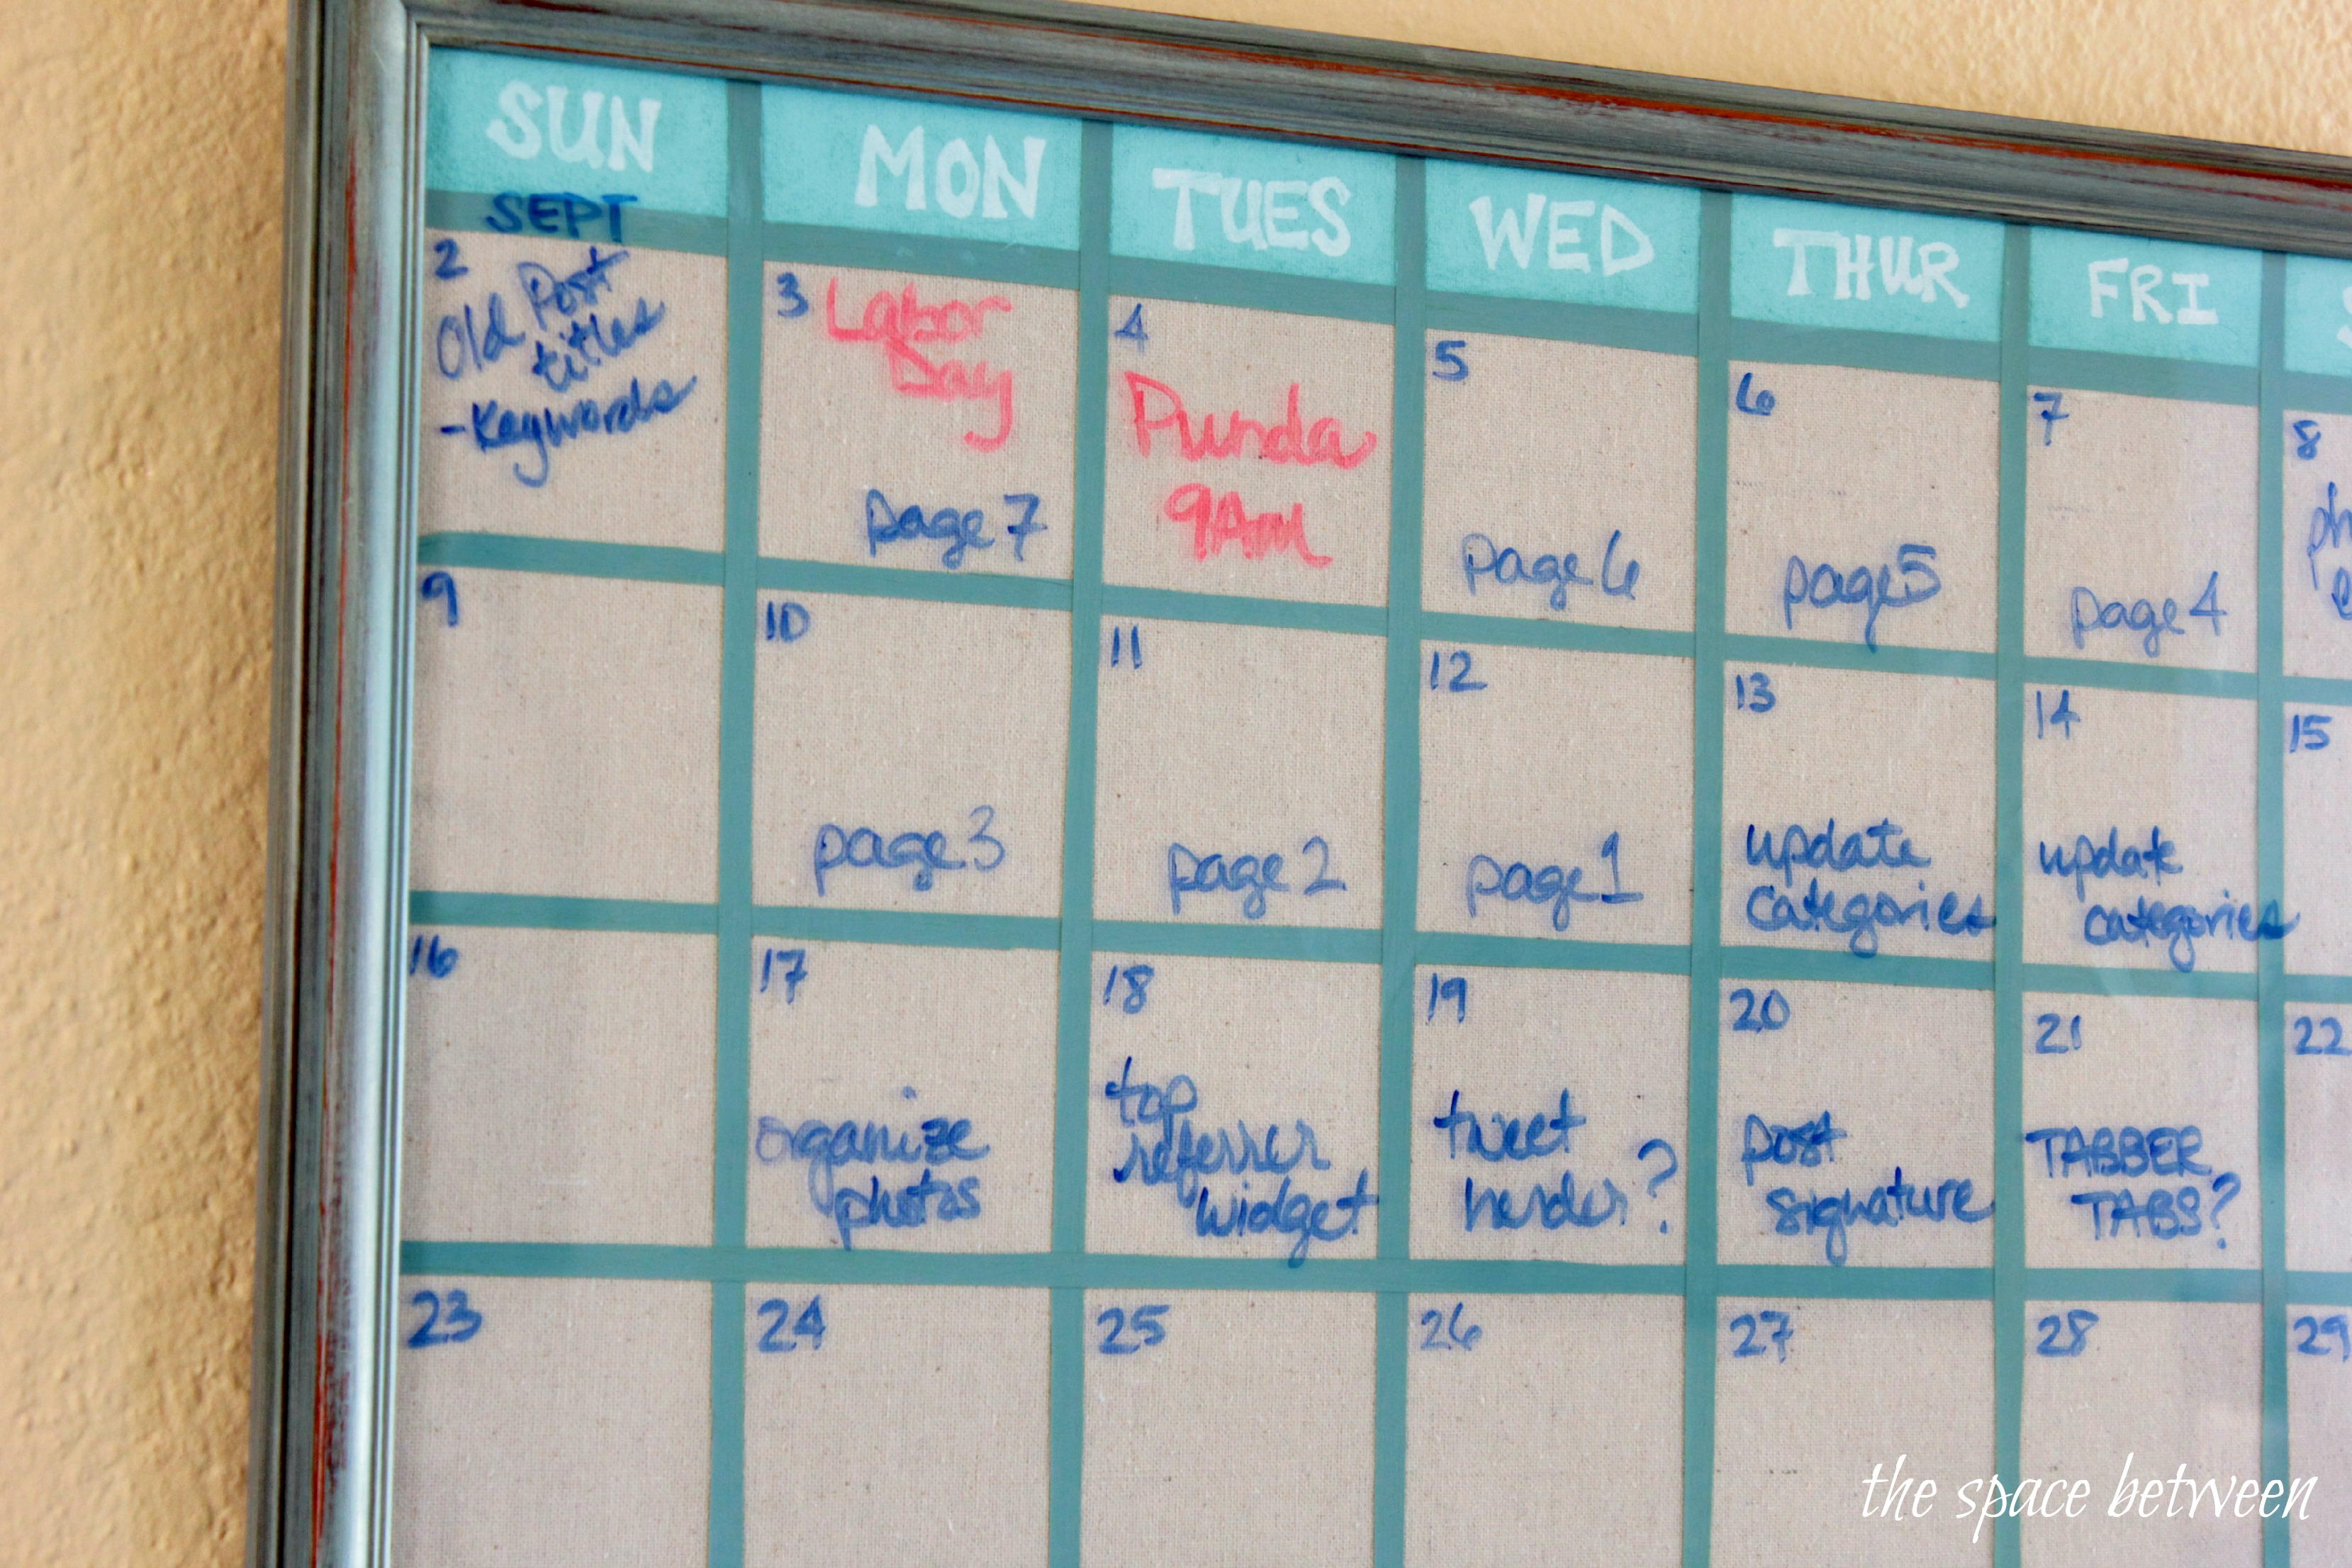 Diy Yearly Wall Calendar : Diy wall calendar